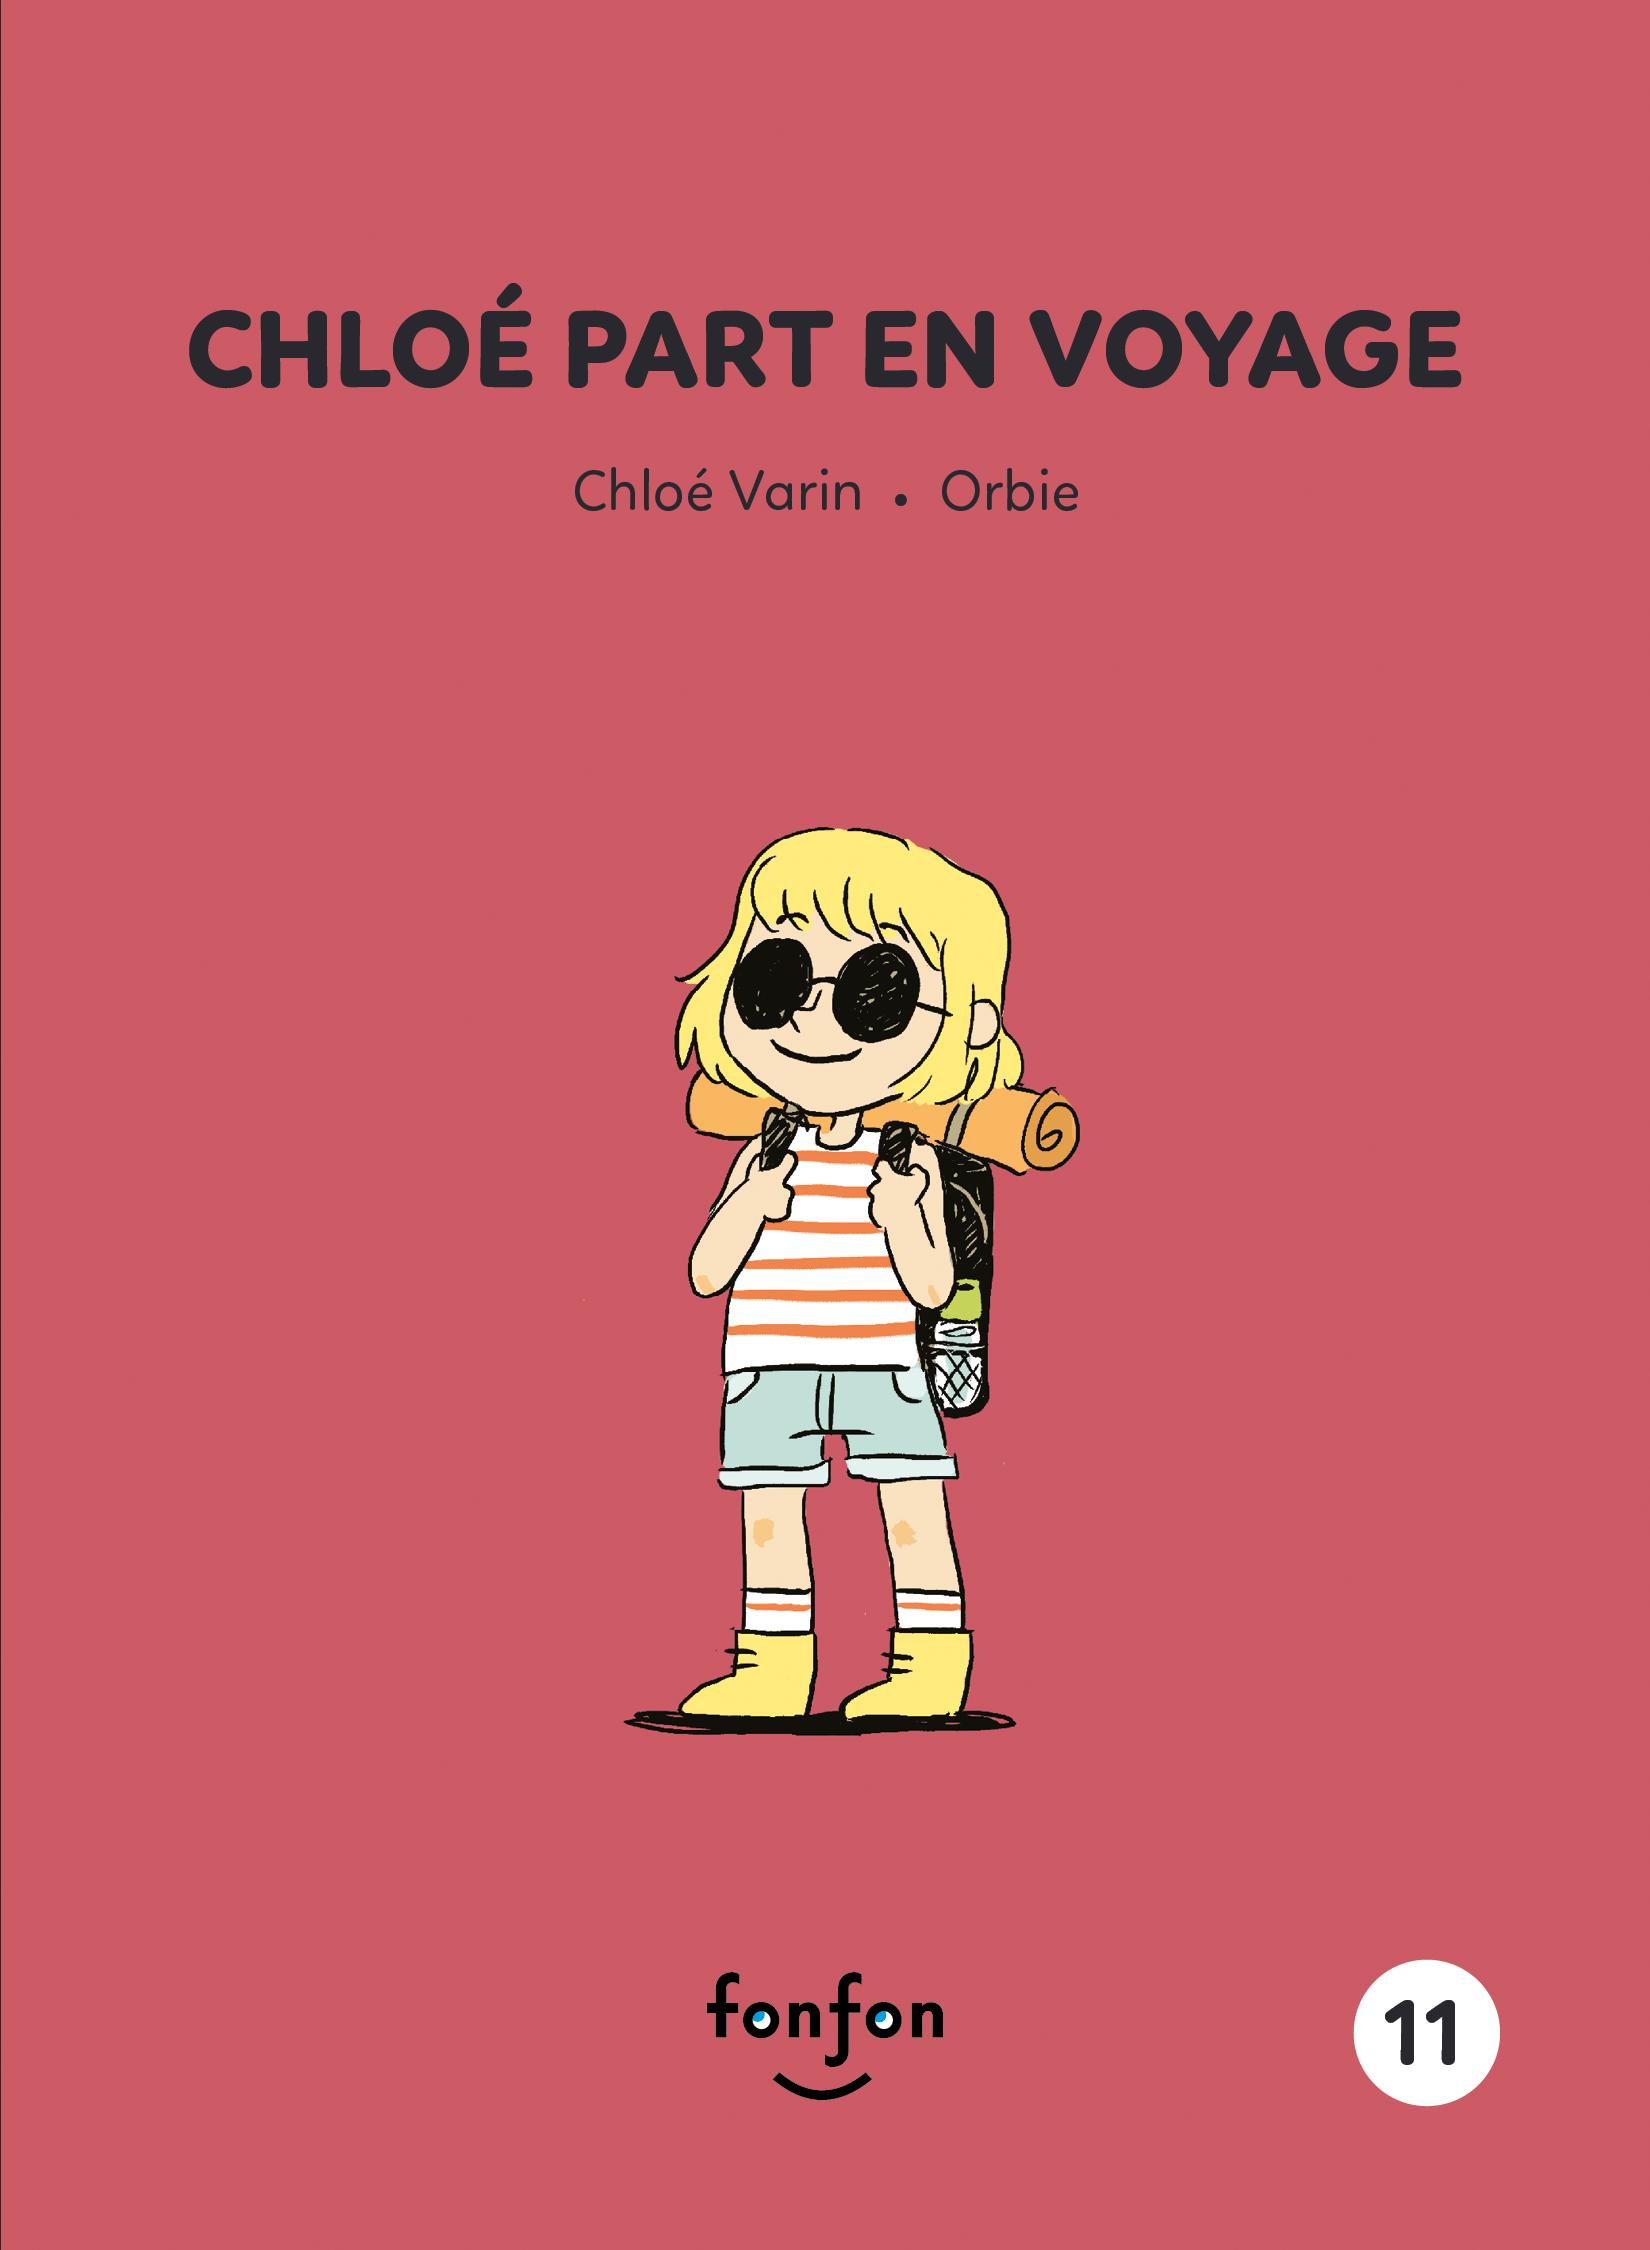 Chloé part en voyage